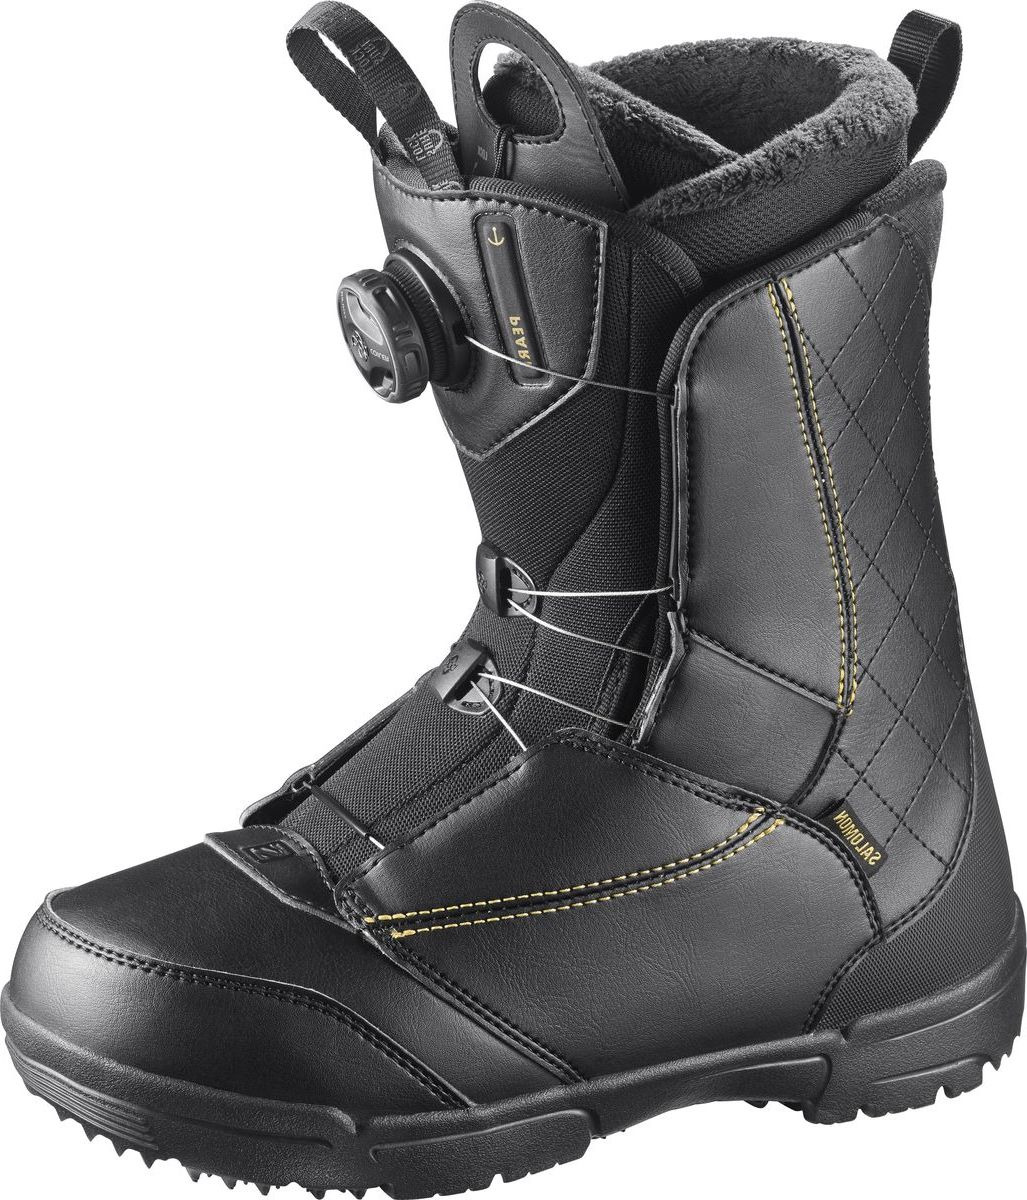 Ботинки для сноуборда Salomon Pearl Boa, цвет: черный, золотистый. Размер 25 (38) ботинки для сноуборда мужские salomon dialogue цвет черный размер 42